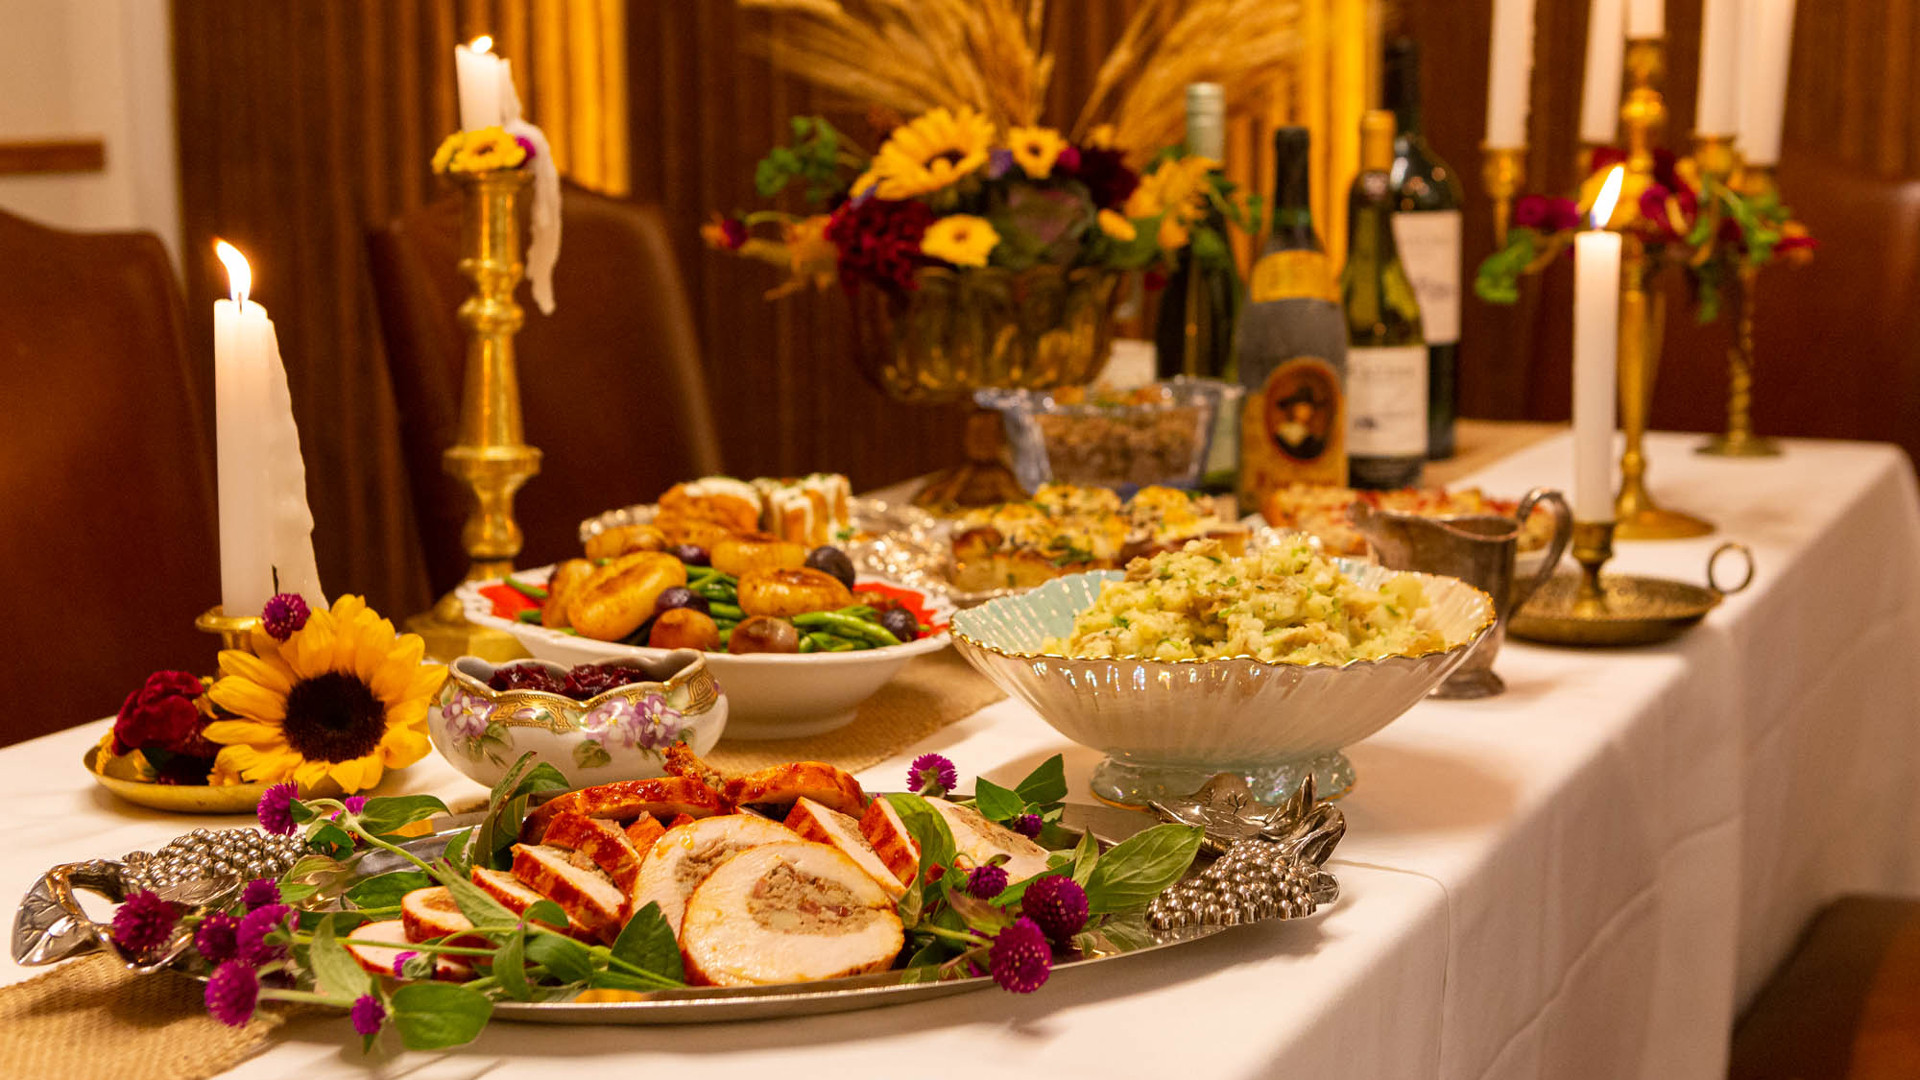 Thanksgiving dinner in Toronto   A spread of Thanksgiving food at Leña Restaurante